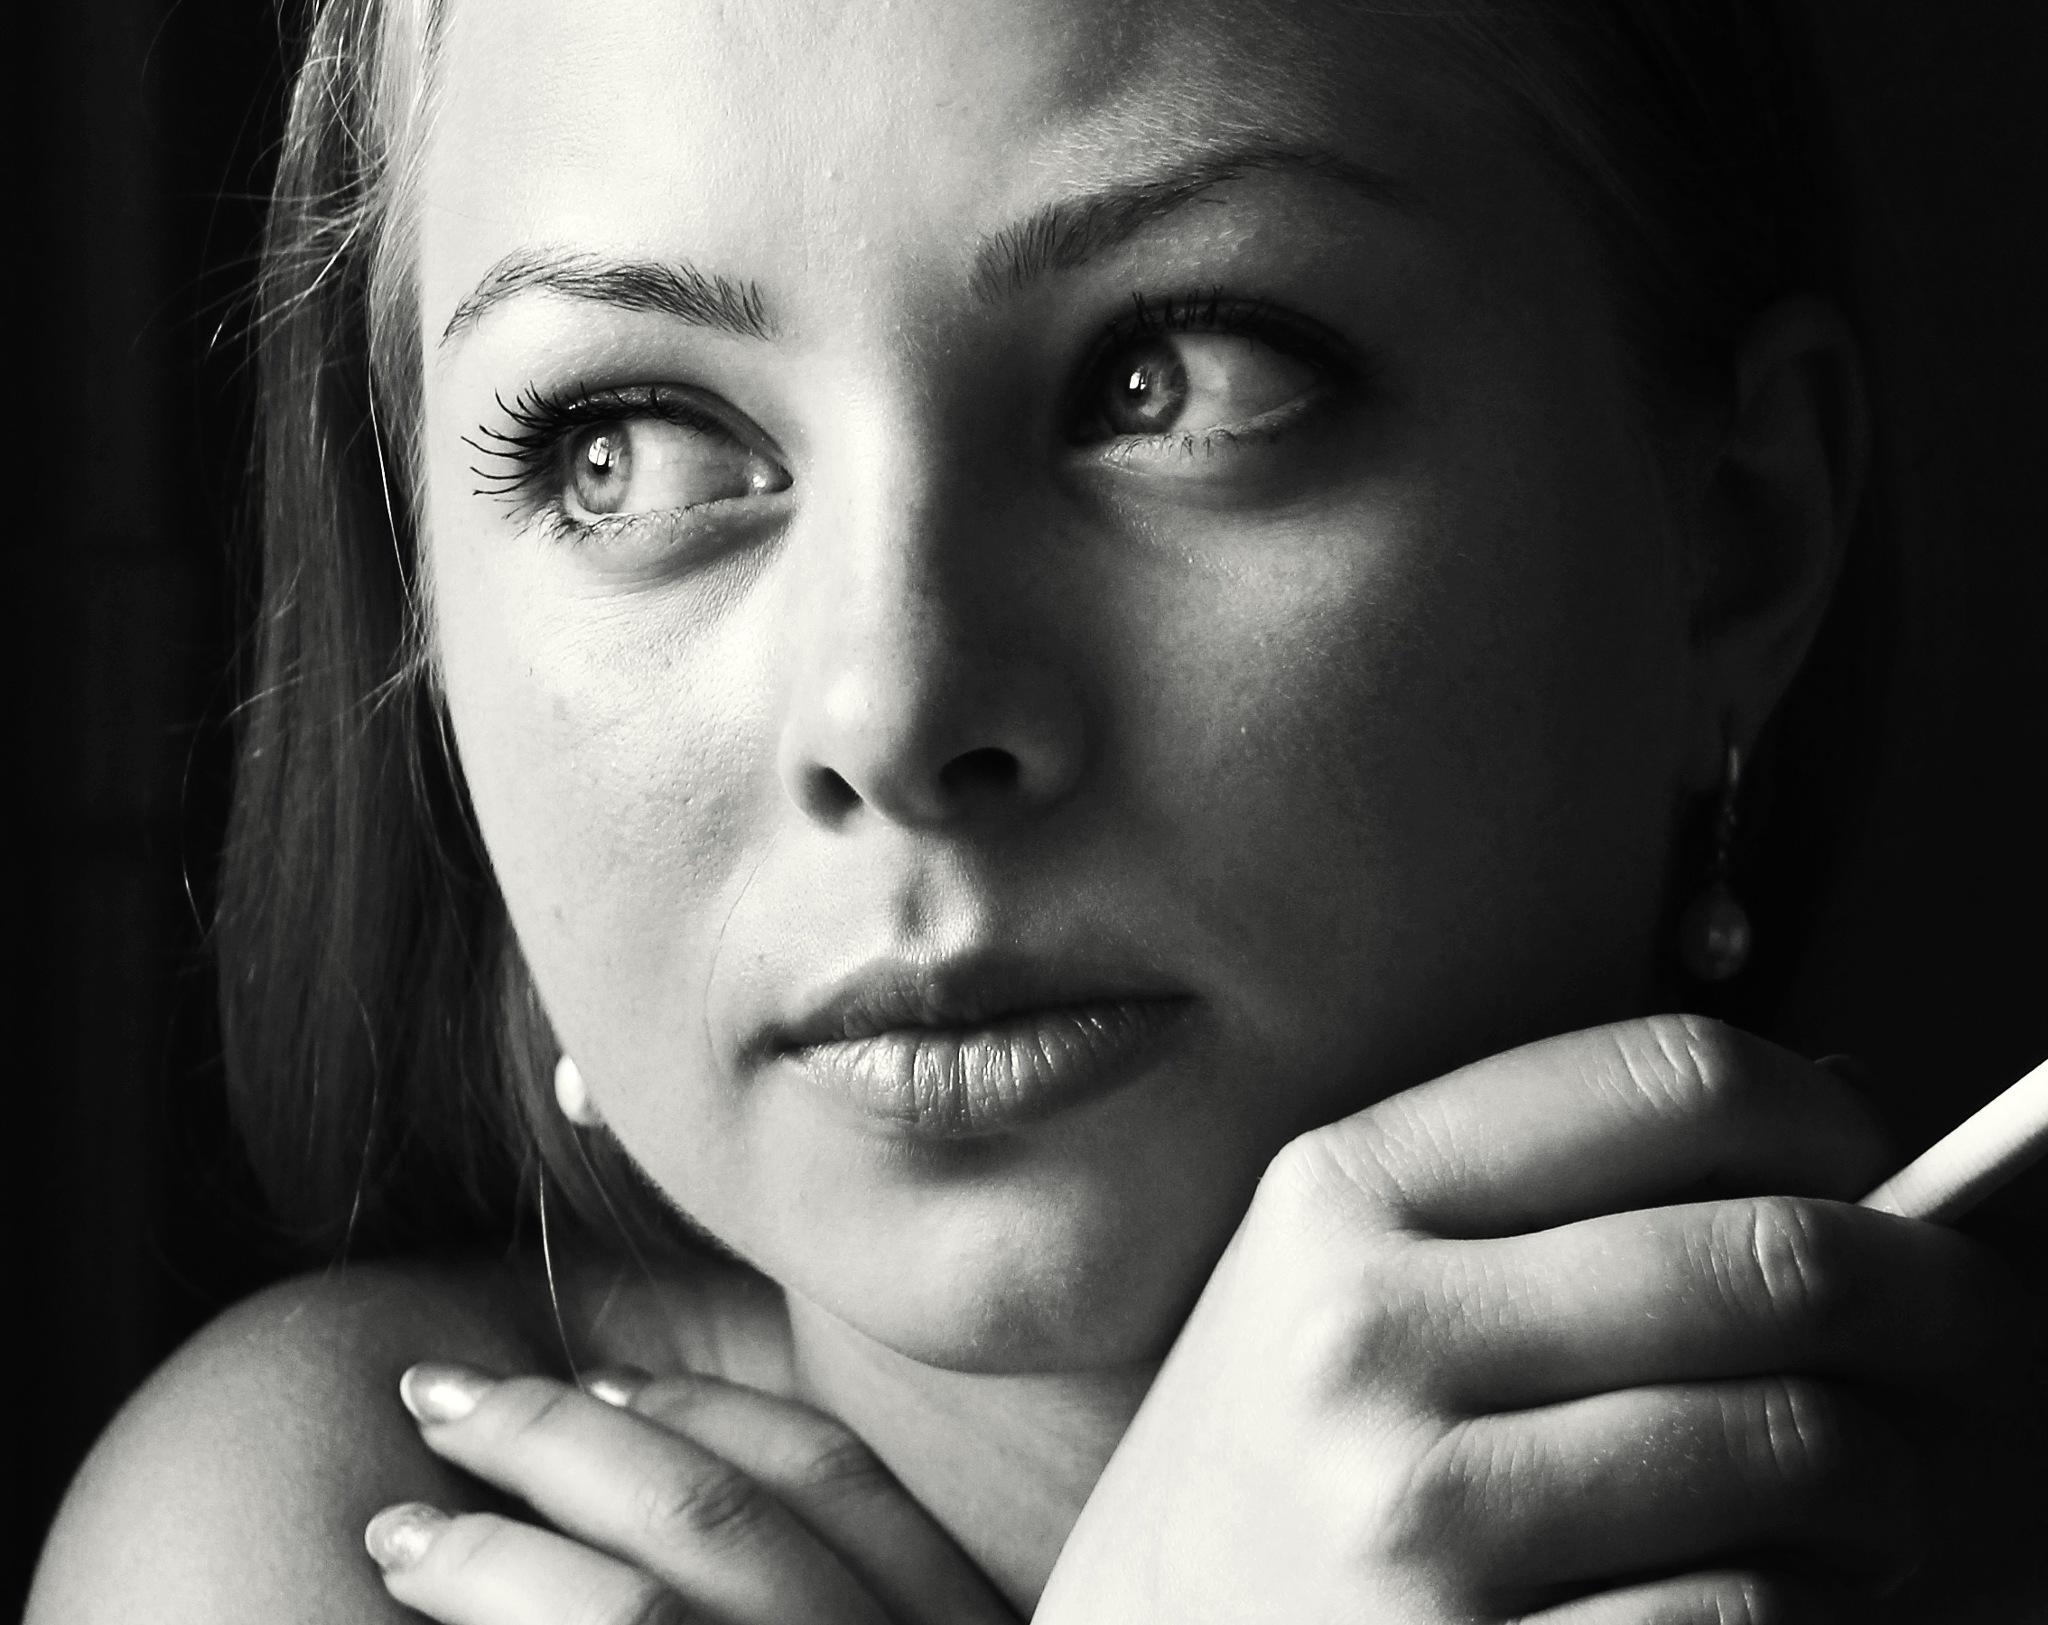 Masha by Сергей Юрьев